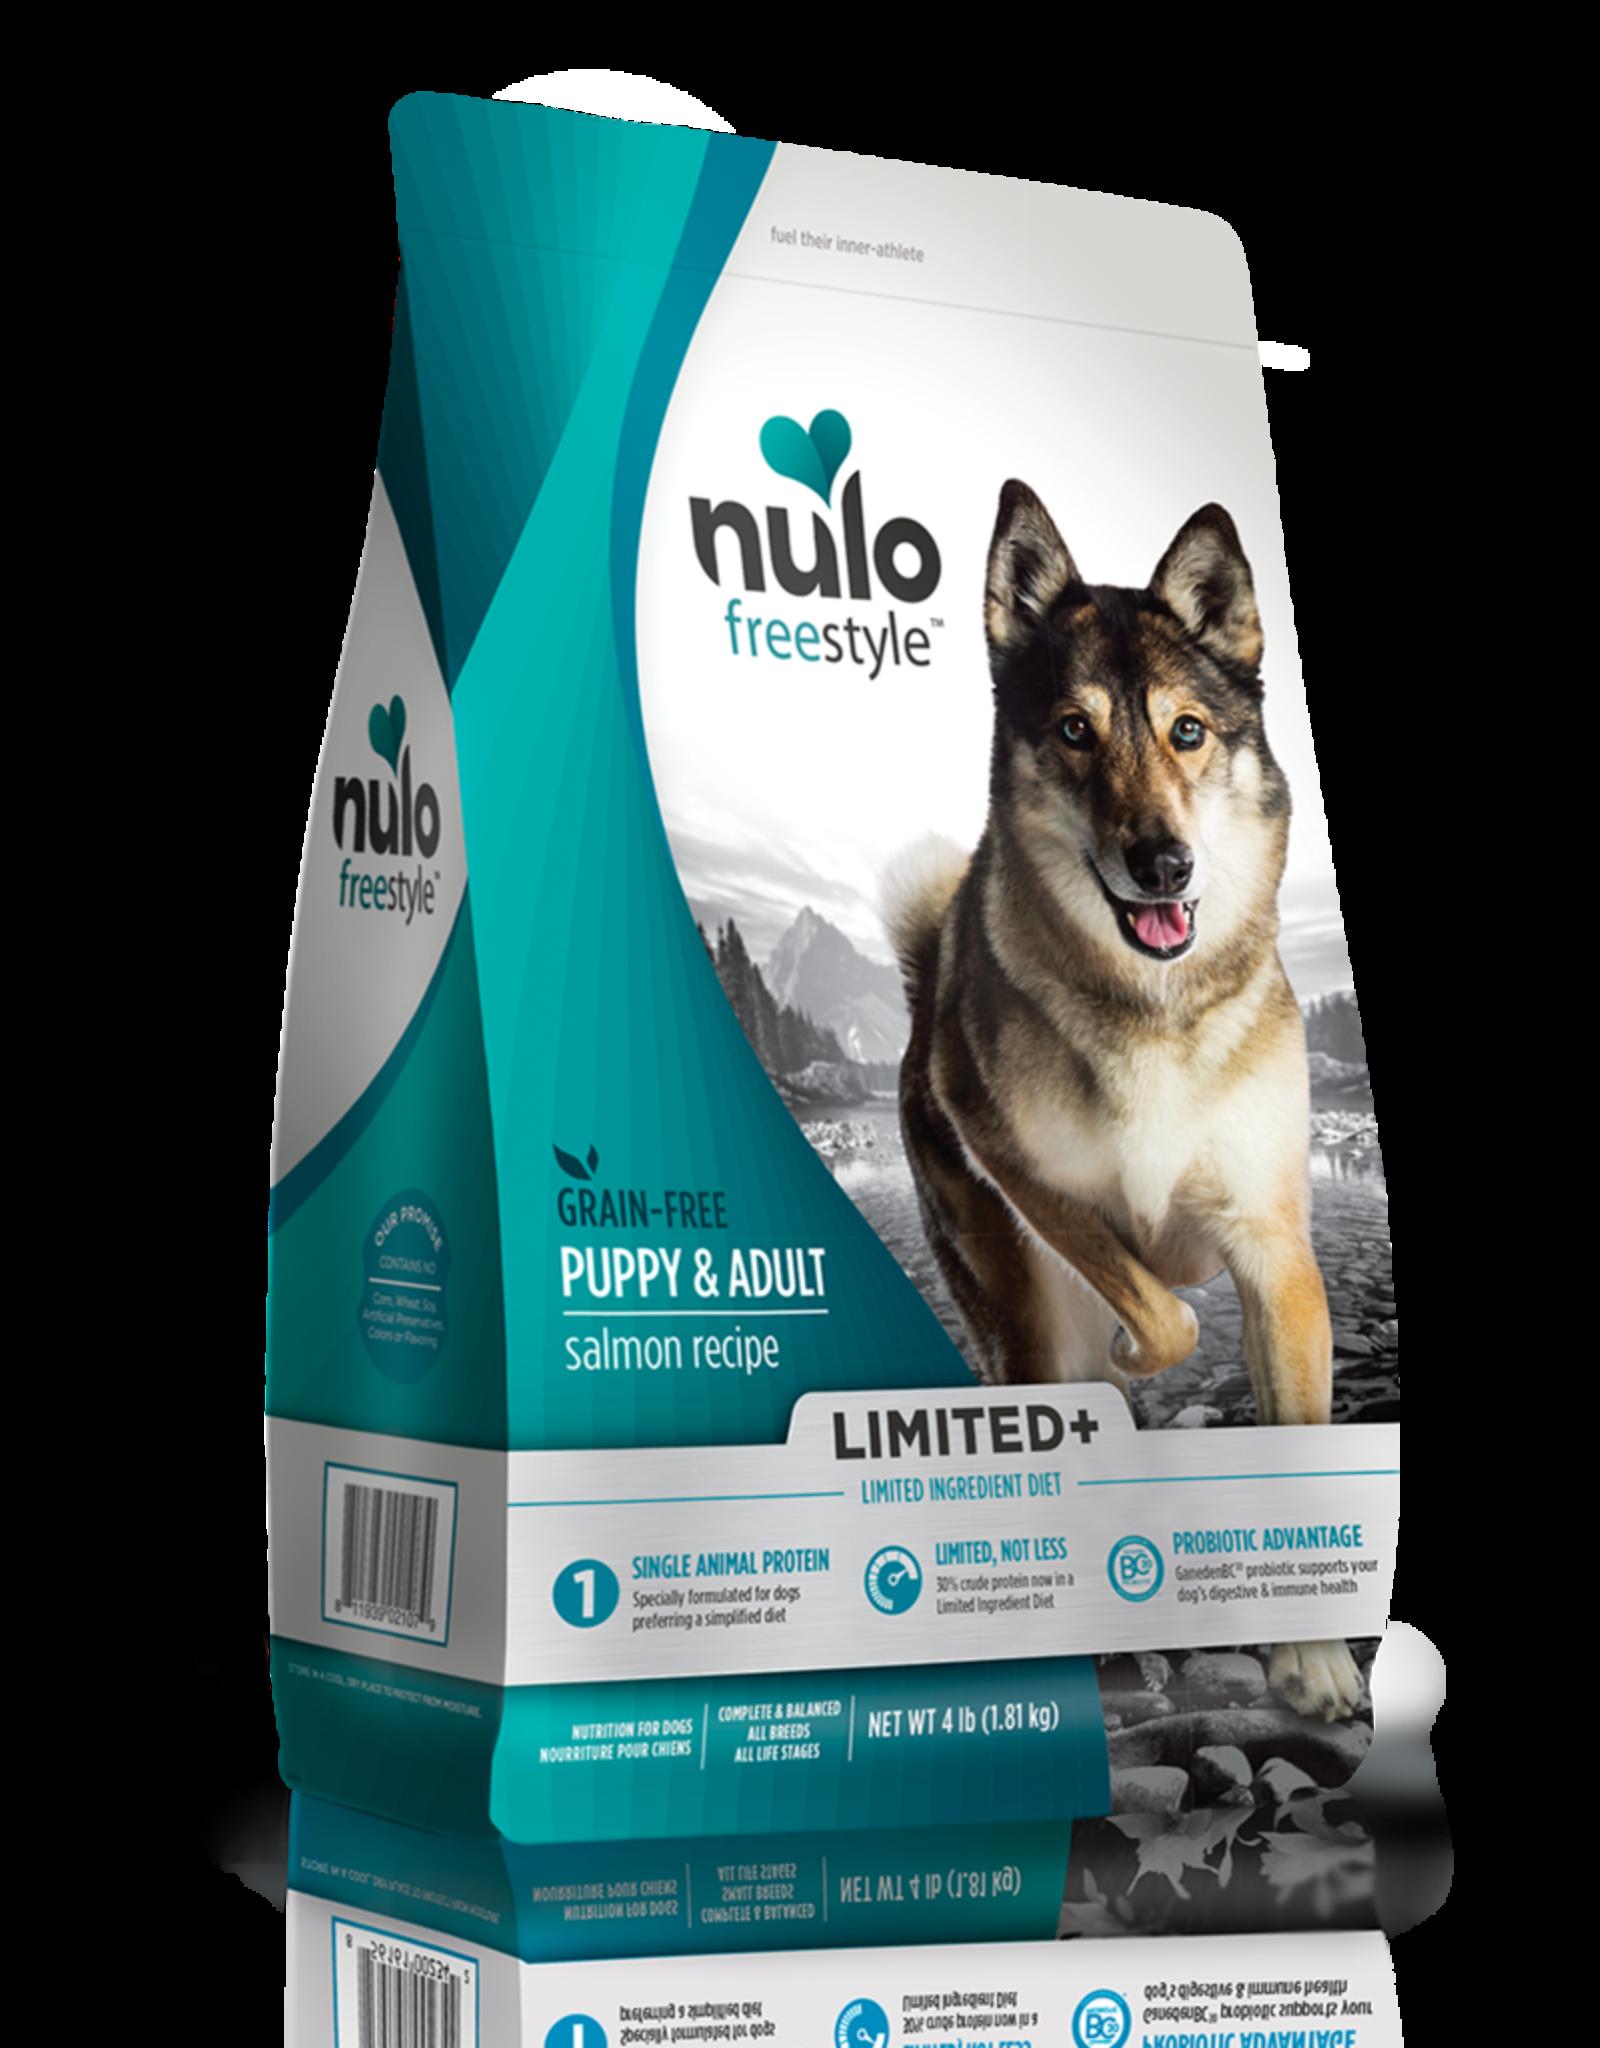 Nulo Dog Freestyle Limited+ Salmon - Grain-Free 22lb